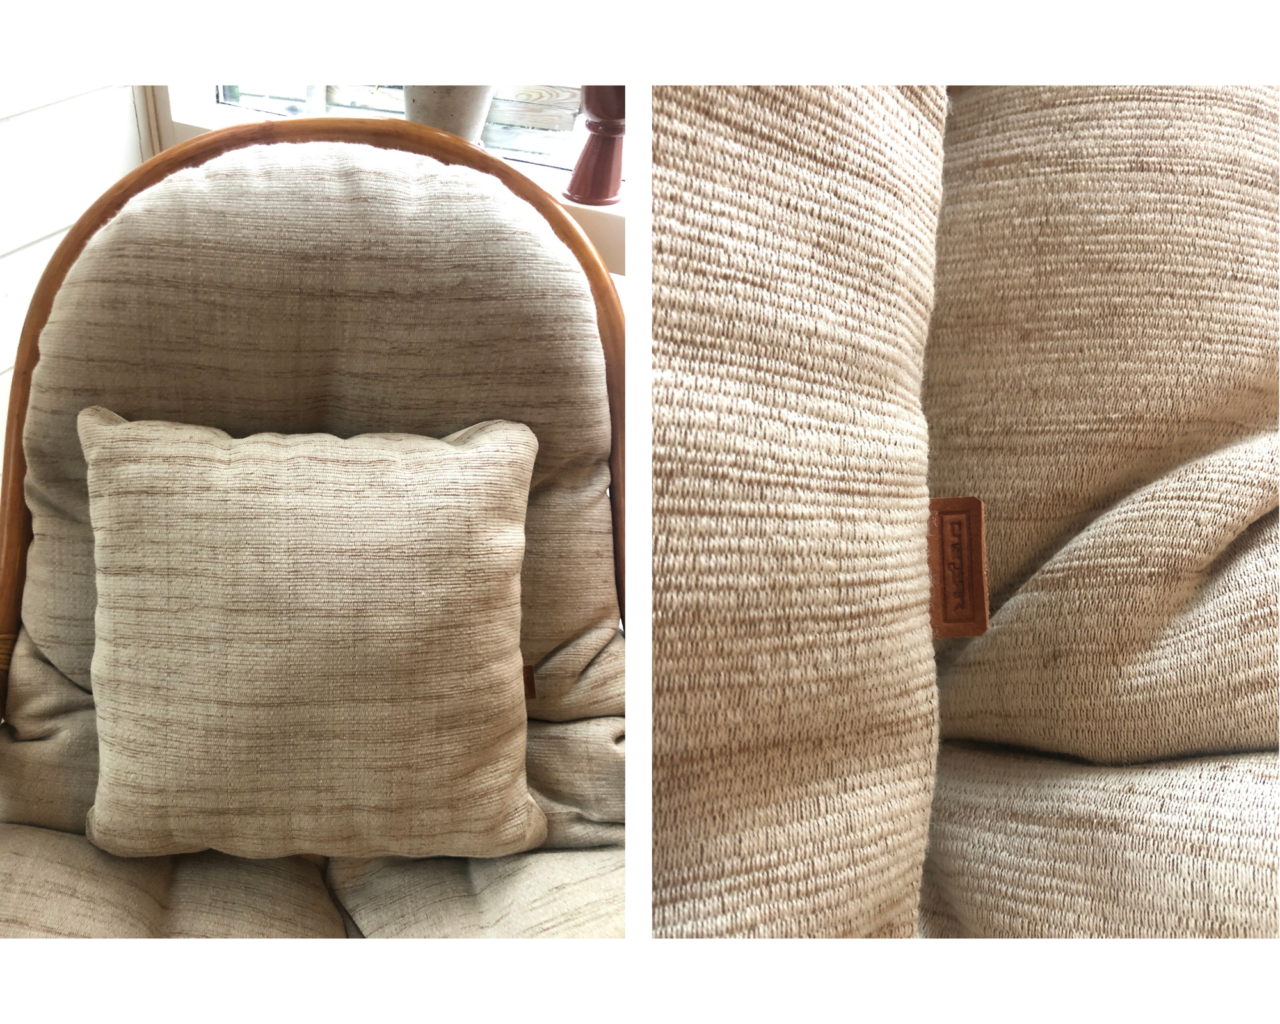 bambus-stol-pute-tag-gammel-skolesekk-caegear